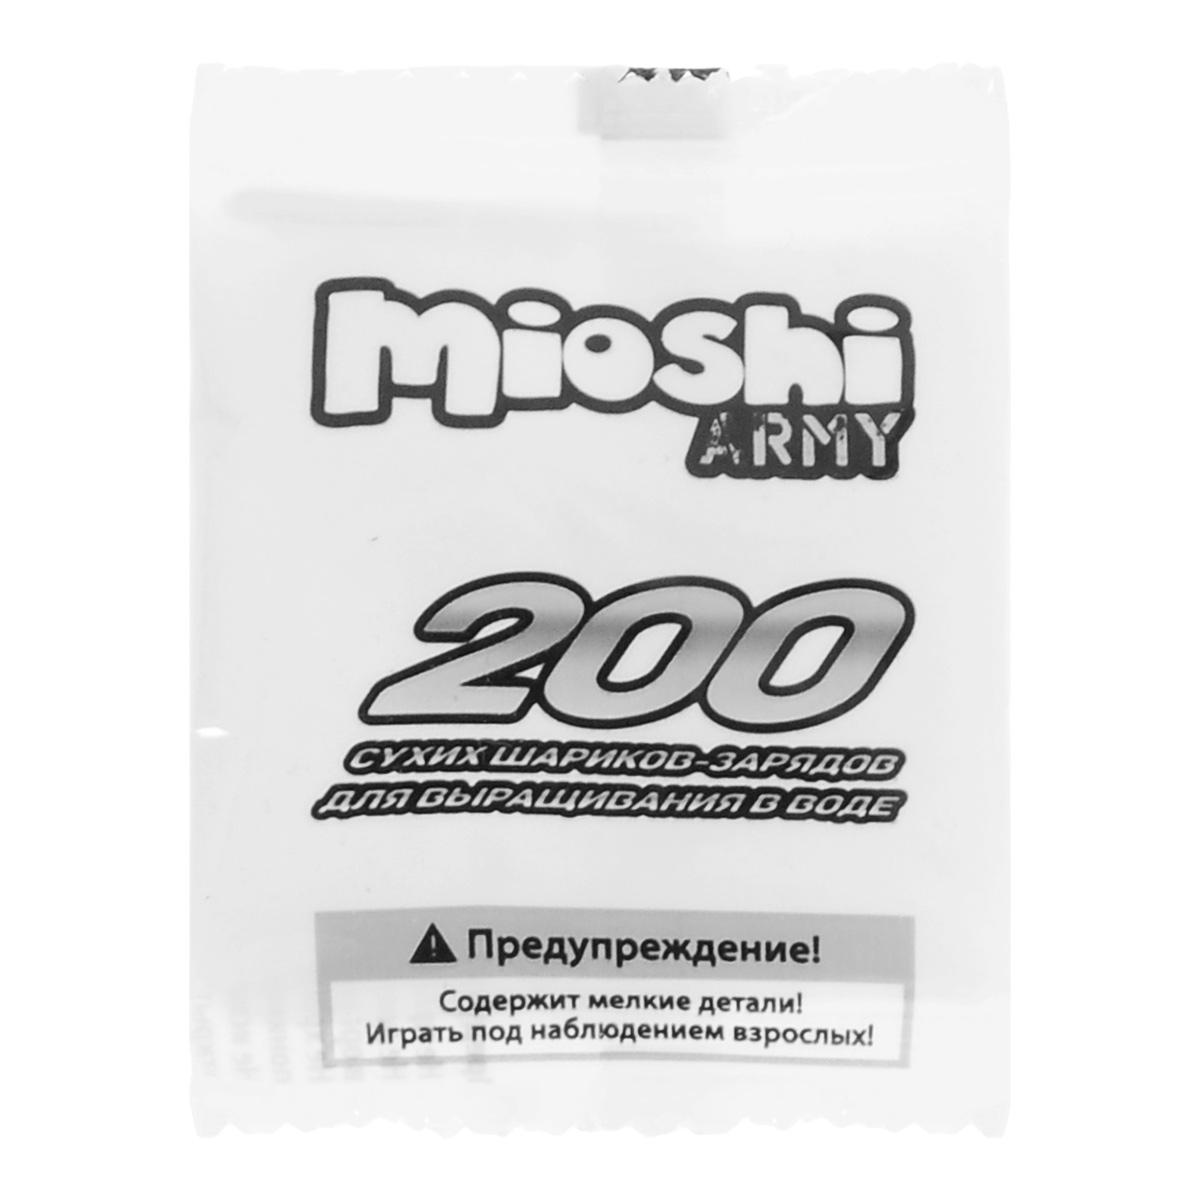 Набор гелевых шариков Mioshi Army, 200 шт